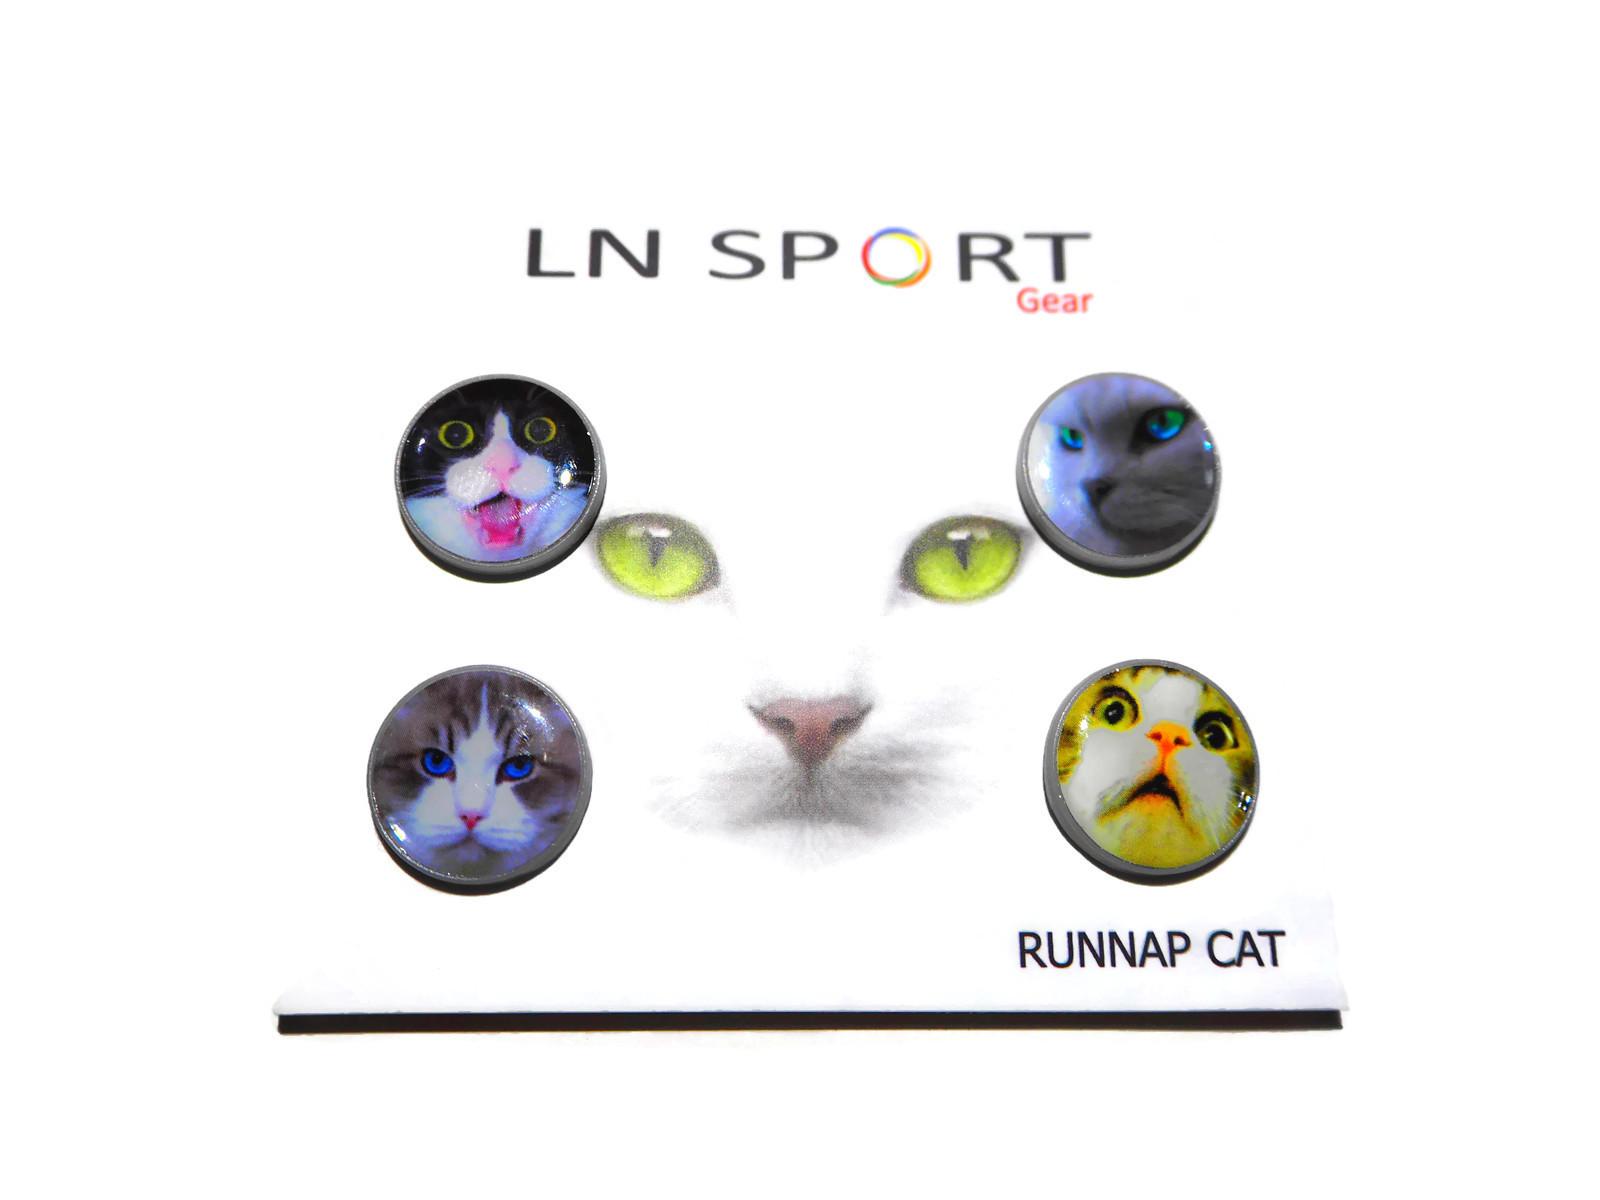 LN Sport ตัวติดเบอร์วิ่ง Runnap (BIB Race Number Holder) ลายแมว for Cat Lover